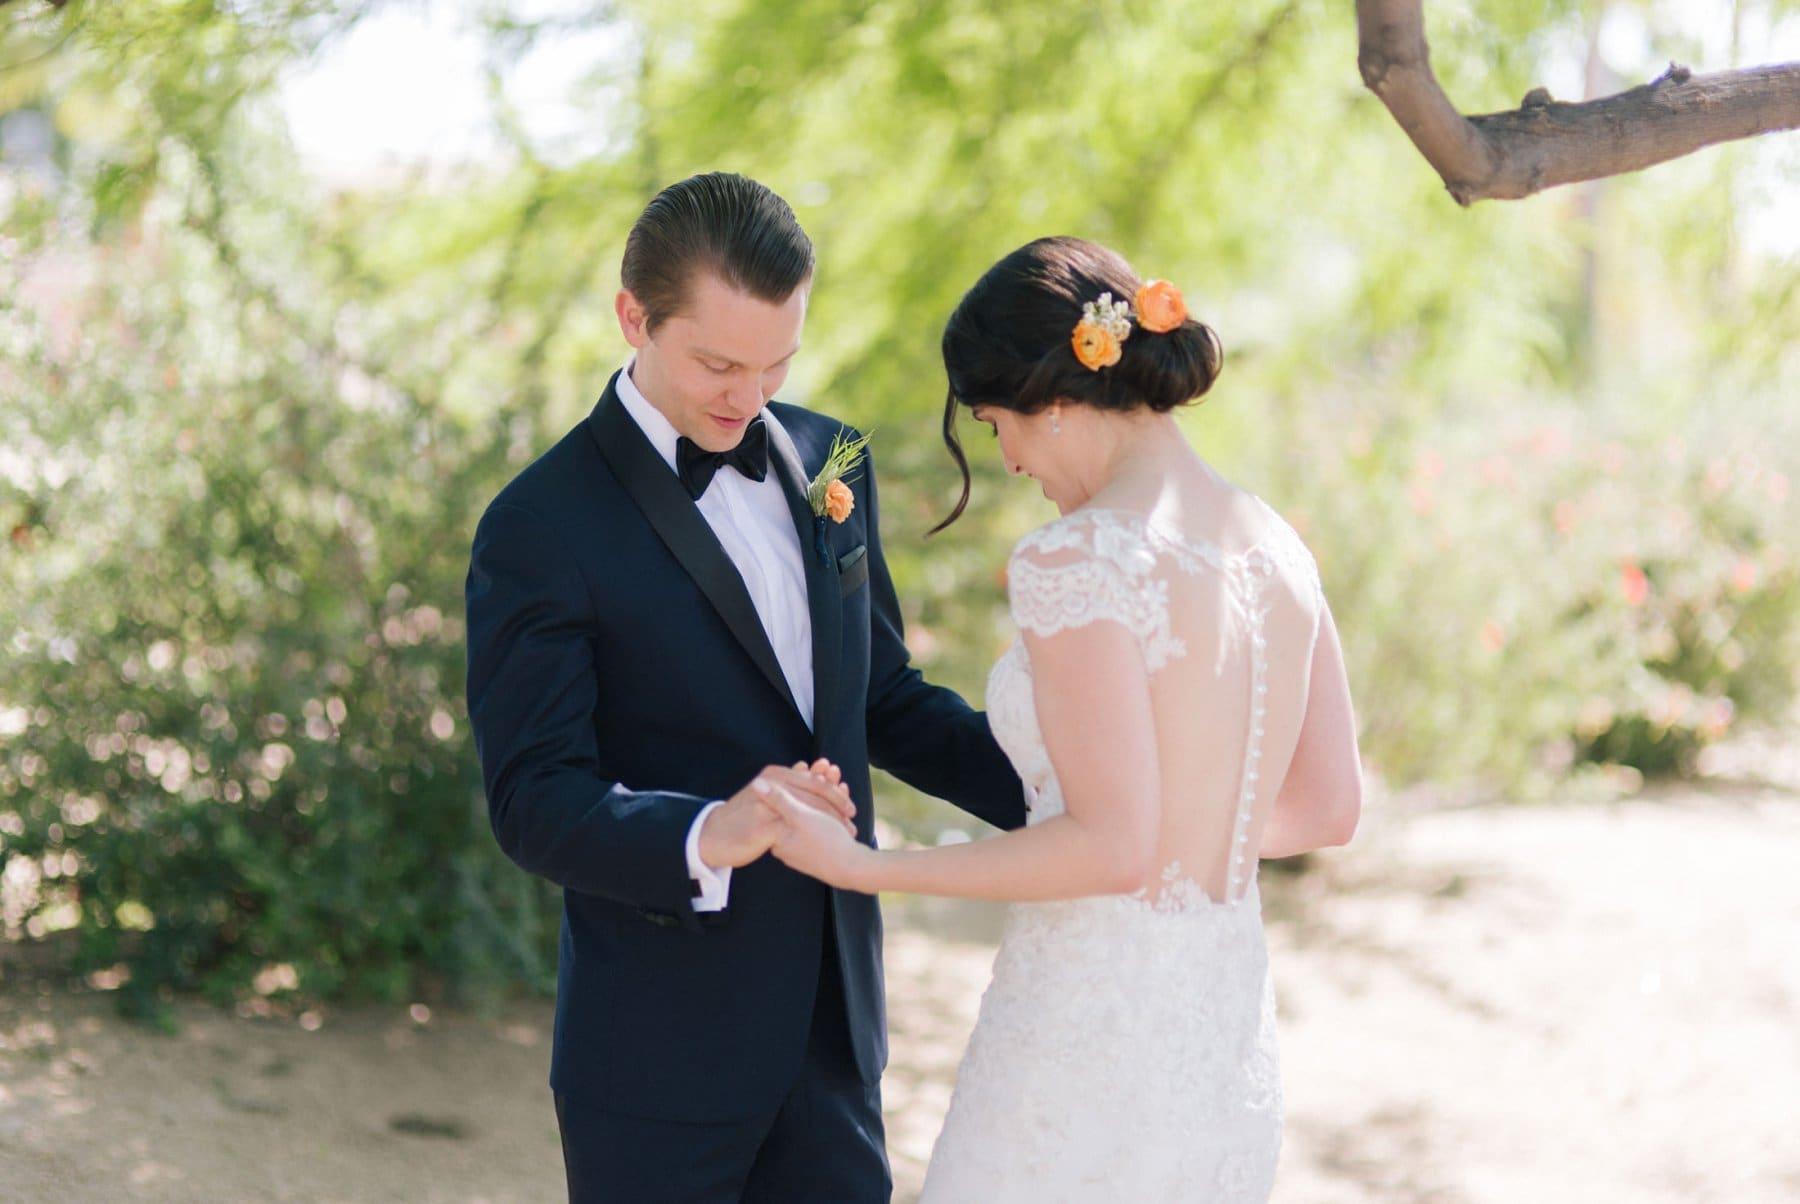 bride and groom first look classy wedding Scottsdale AZ